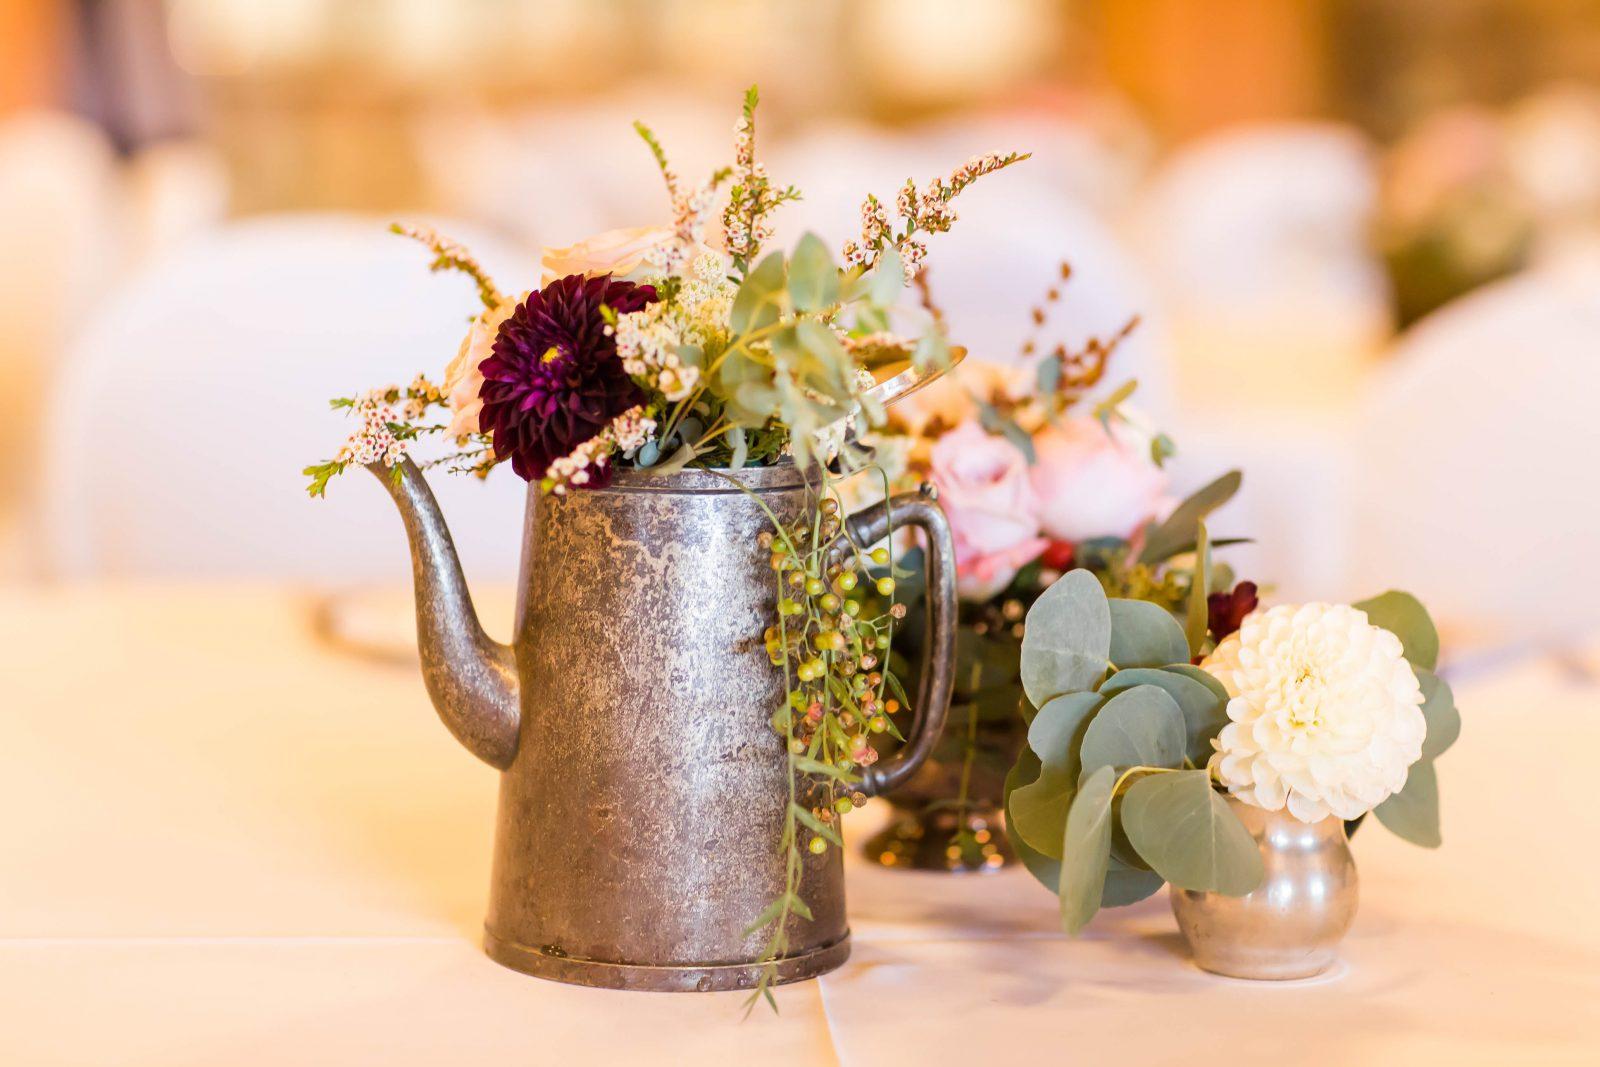 sunny-hill-wedding-venue-loren-jackson-photography-36